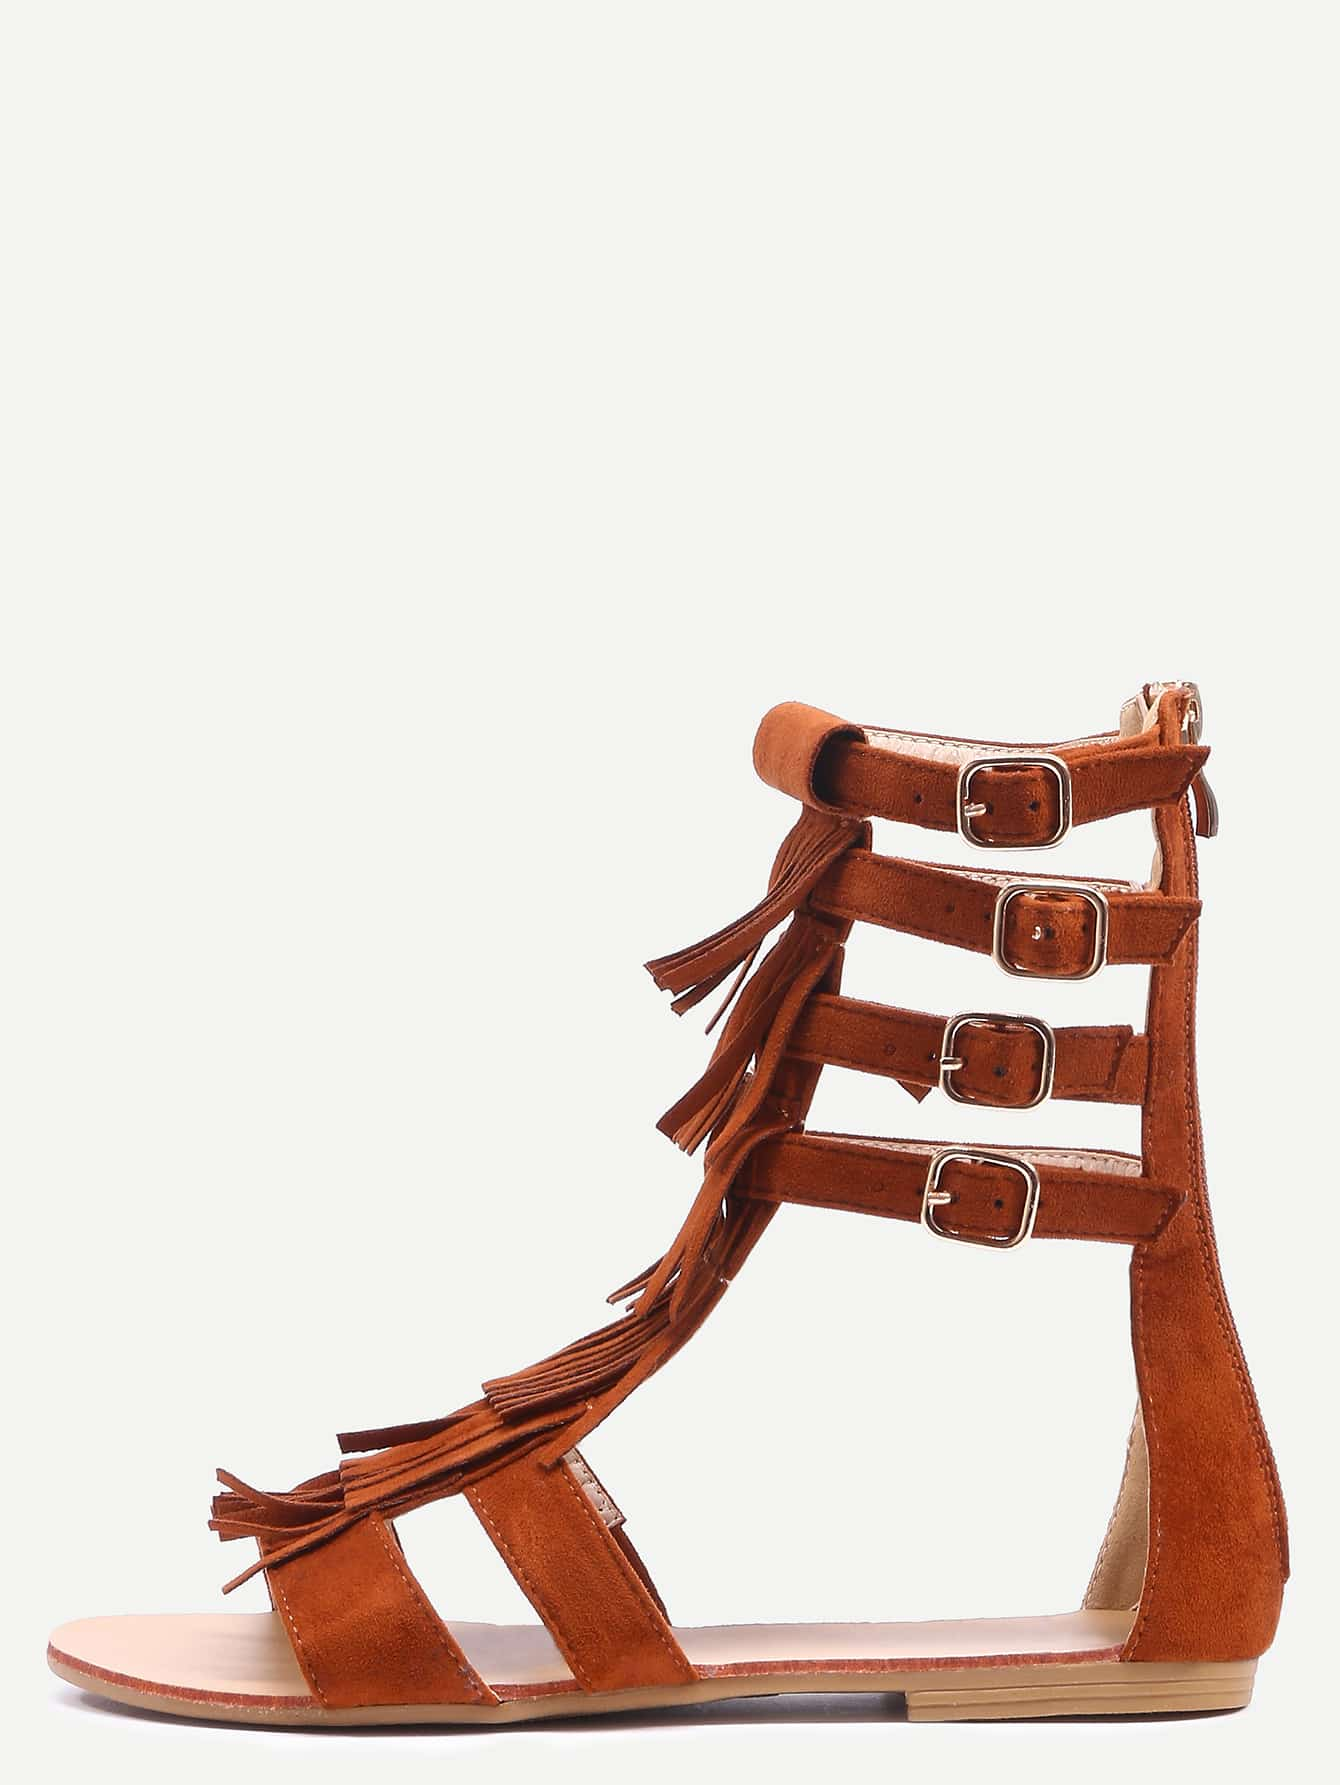 gladiator sandalen mit quasten kunszleder kamel german shein sheinside. Black Bedroom Furniture Sets. Home Design Ideas